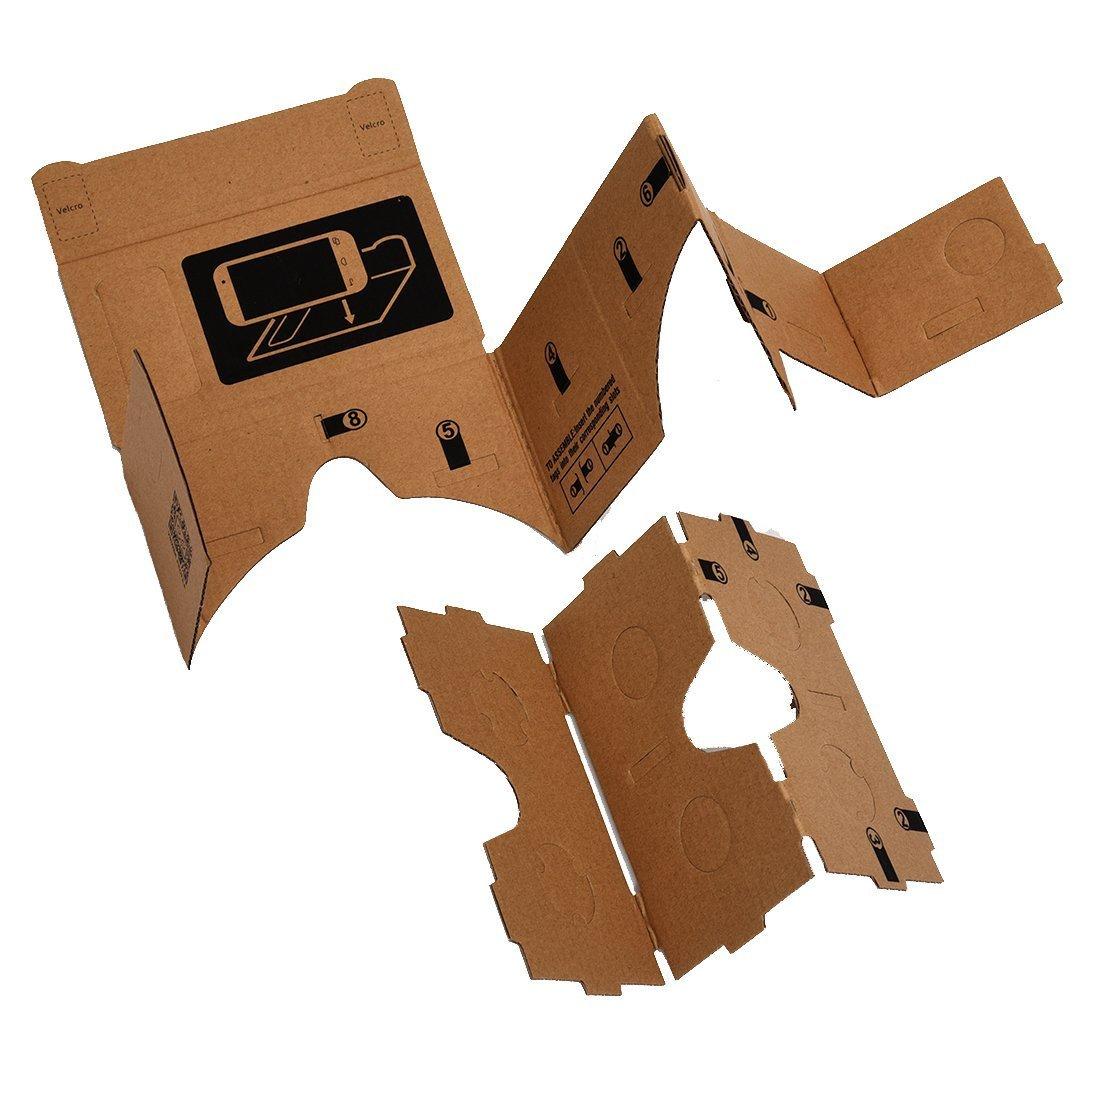 3D Virtual Reality Glasses - TOOGOO (R) Mobile phone cardboard quality 3D Virtual Reality Glasses by SODIAL (Image #4)